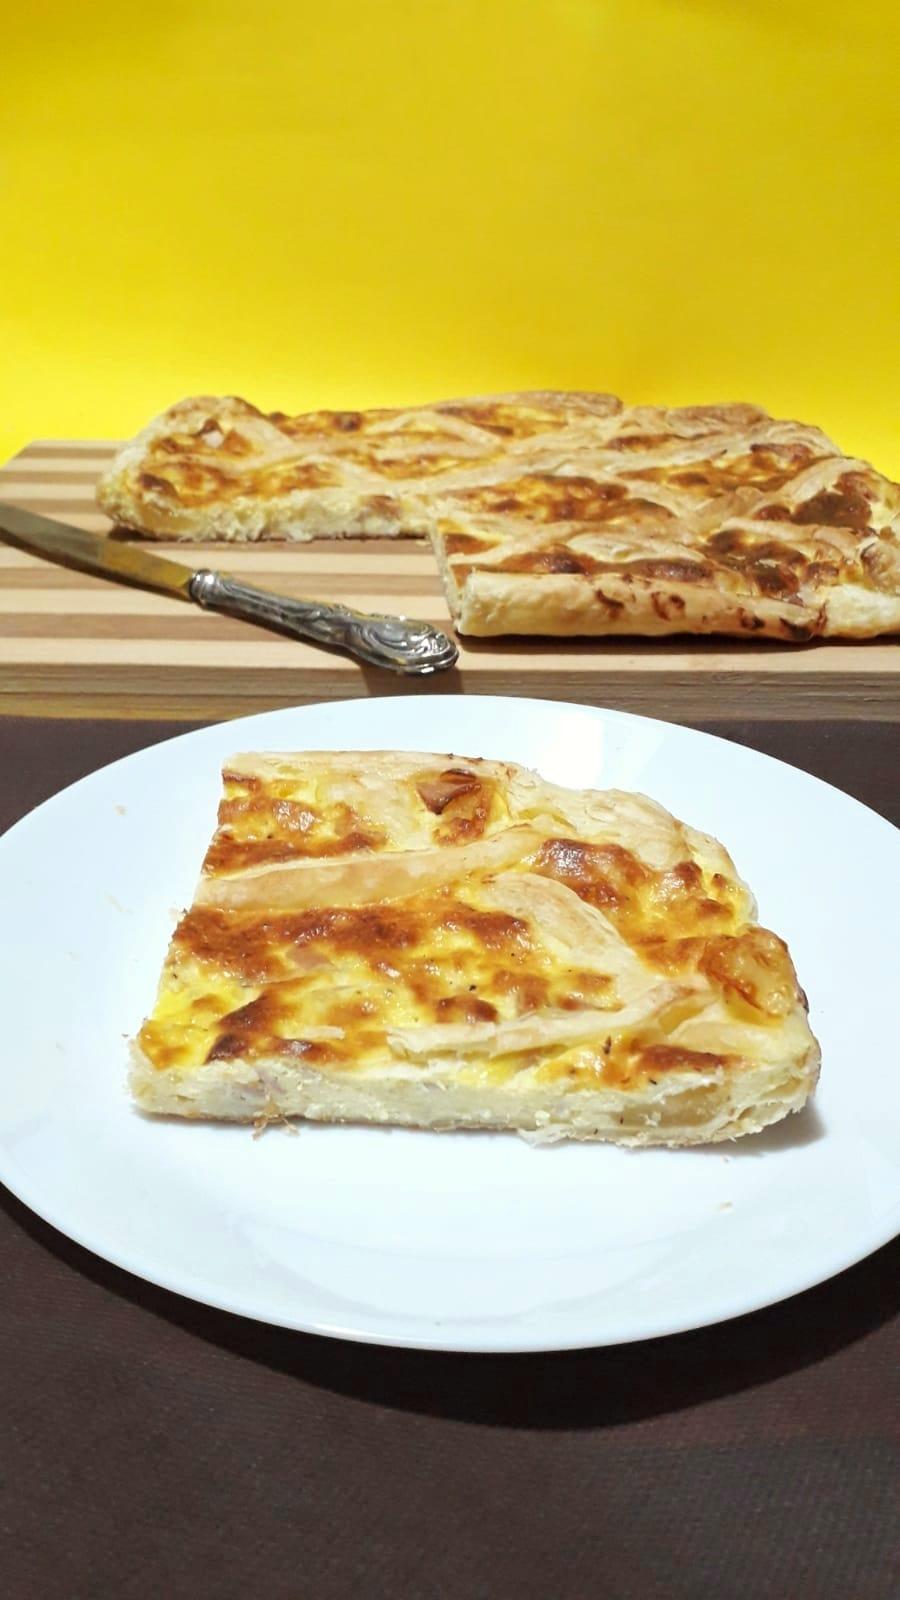 Torta salata ricotta e prosciutto